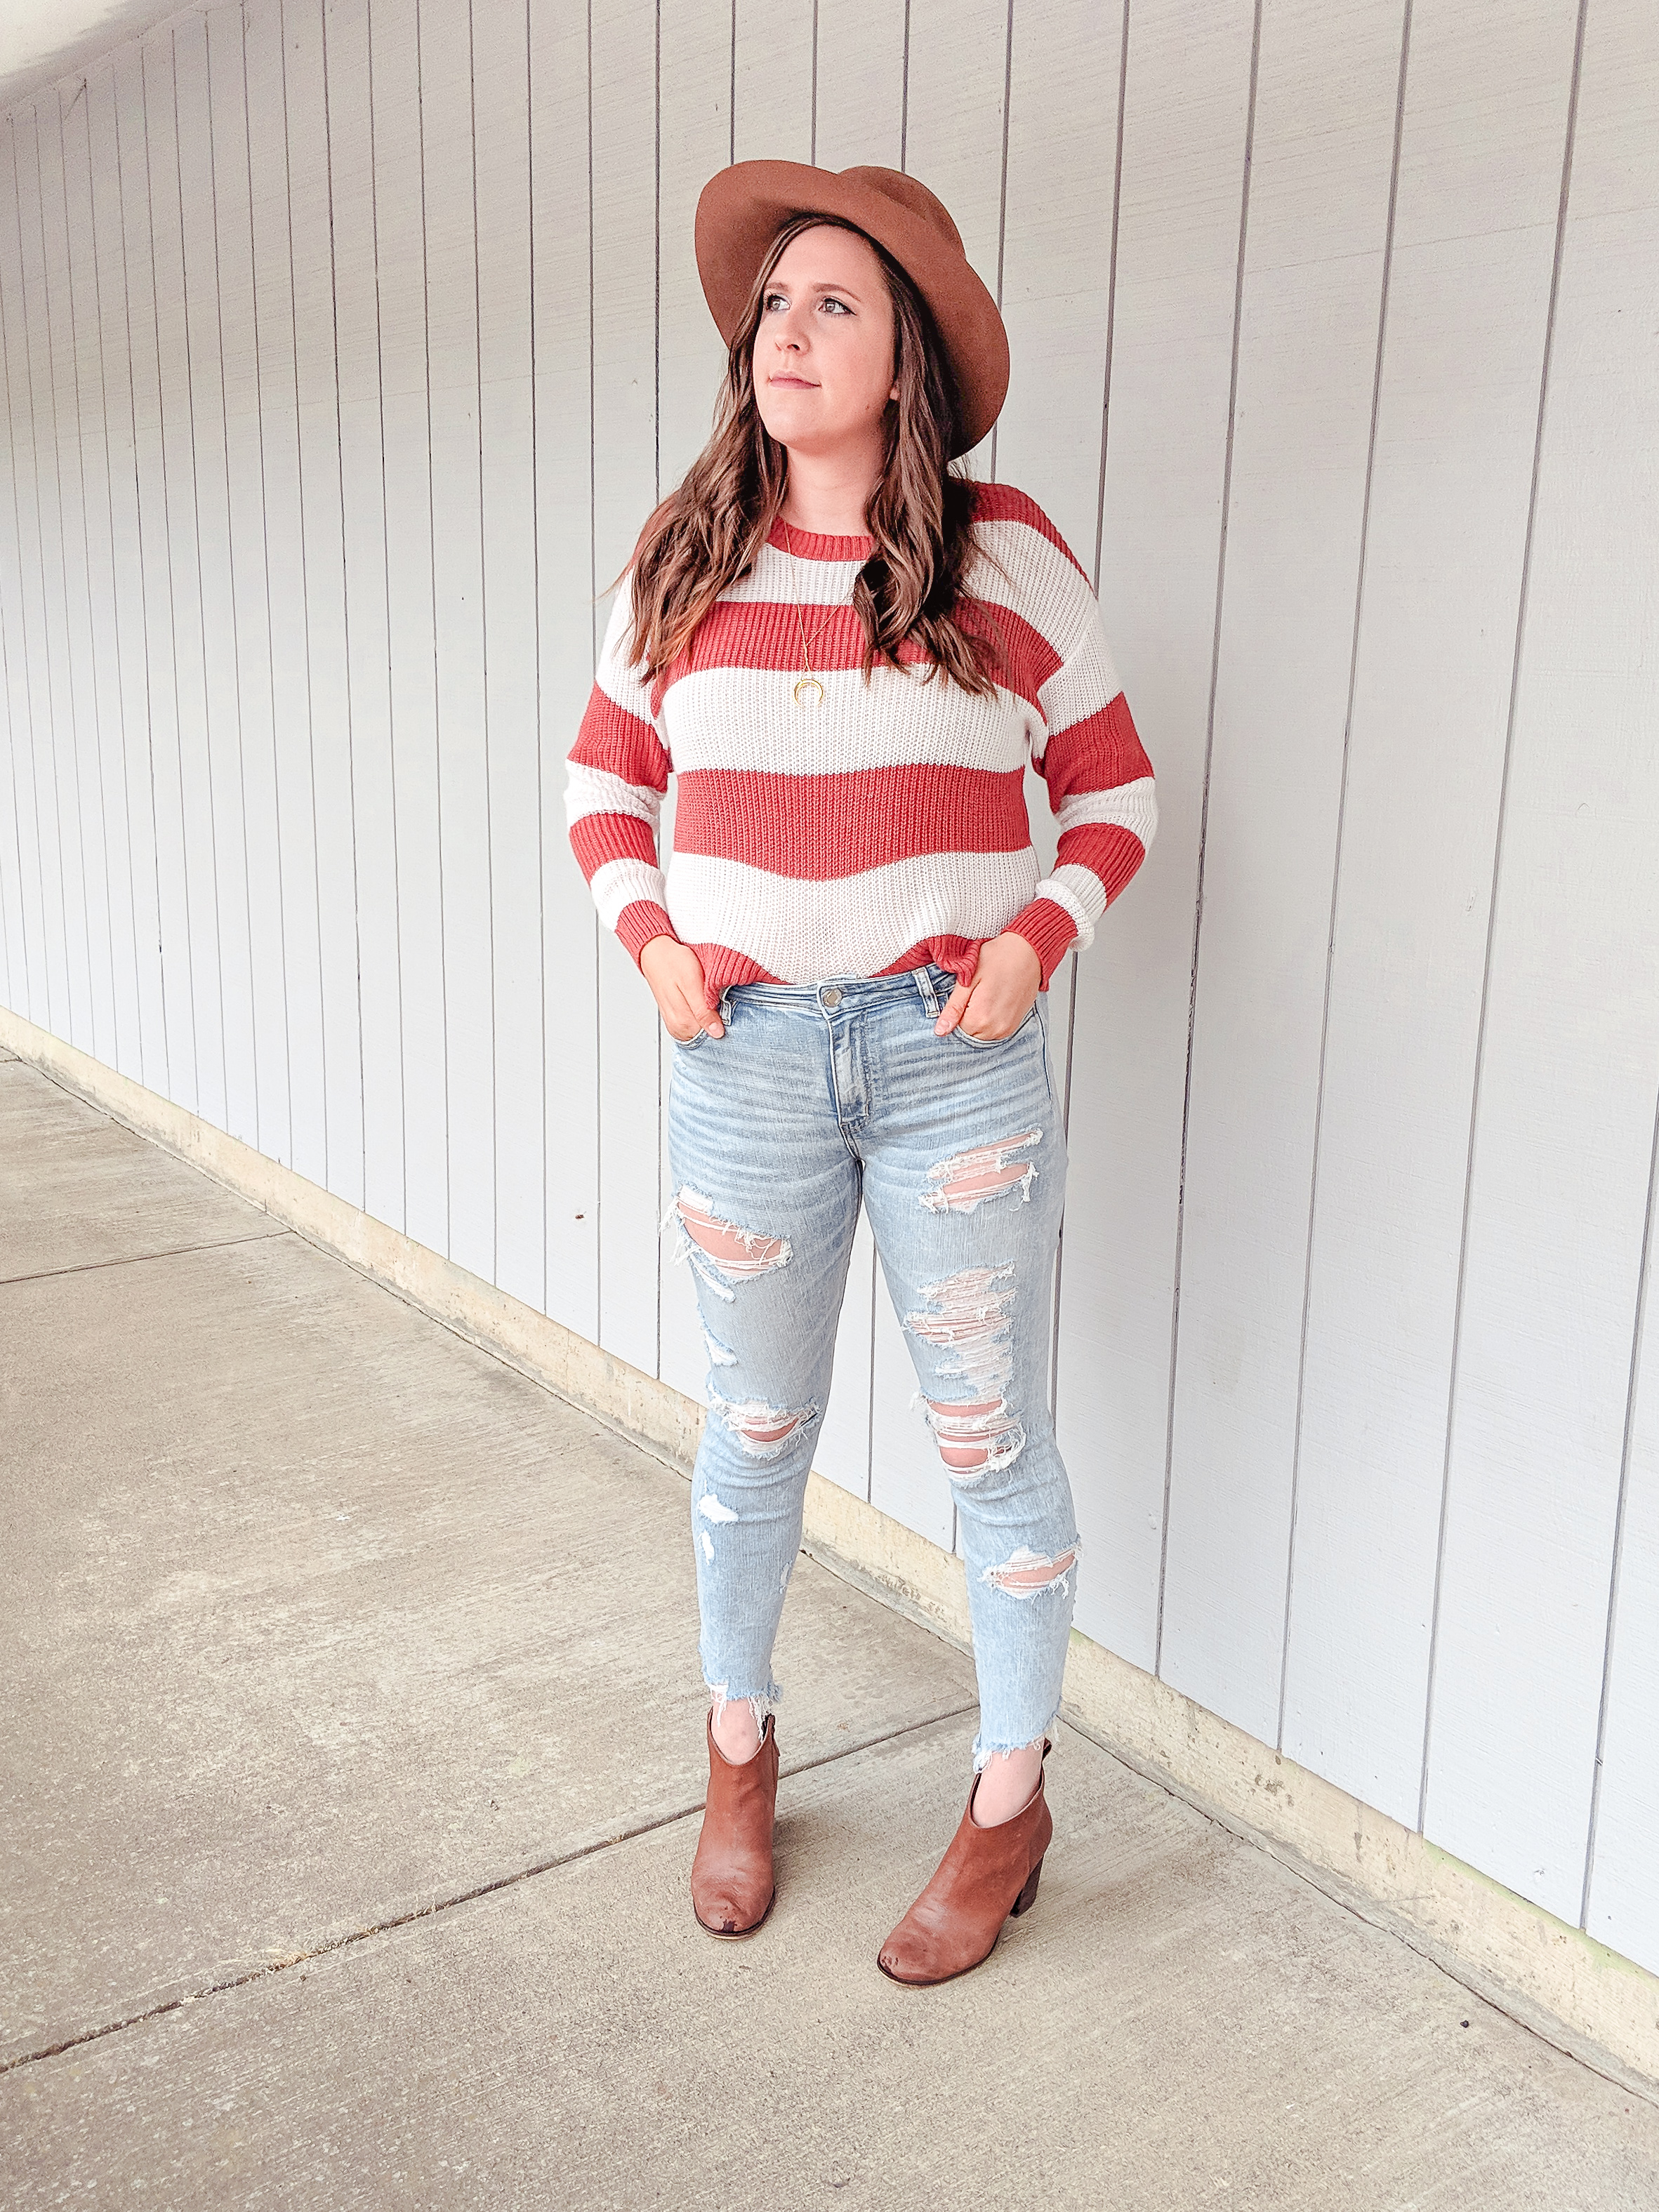 Striped Sweater Fall Fashion StylebyJulianne